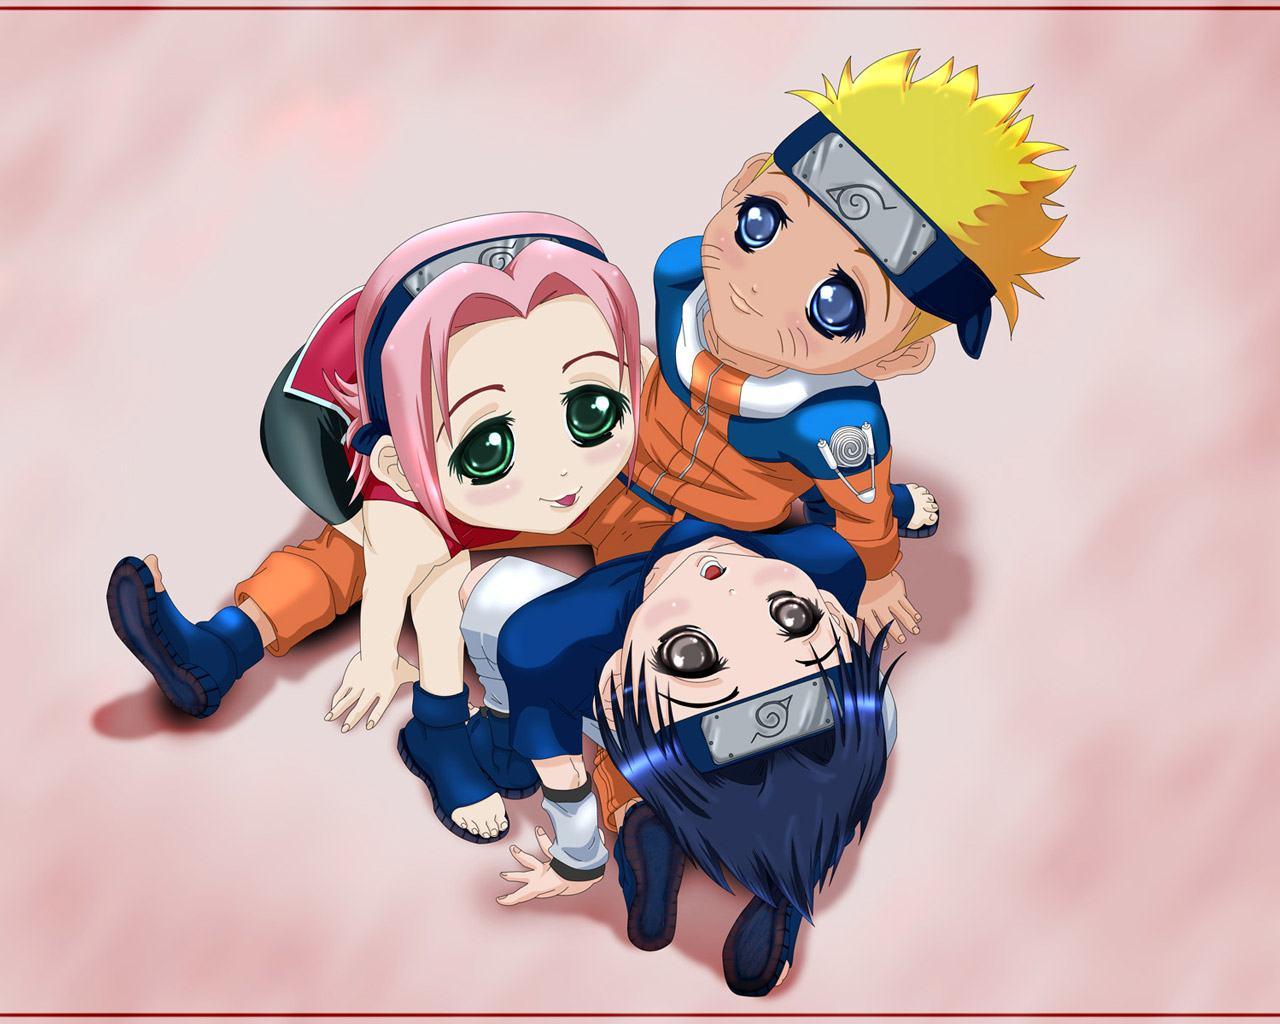 Cute Naruto Wallpapers Top Free Cute Naruto Backgrounds